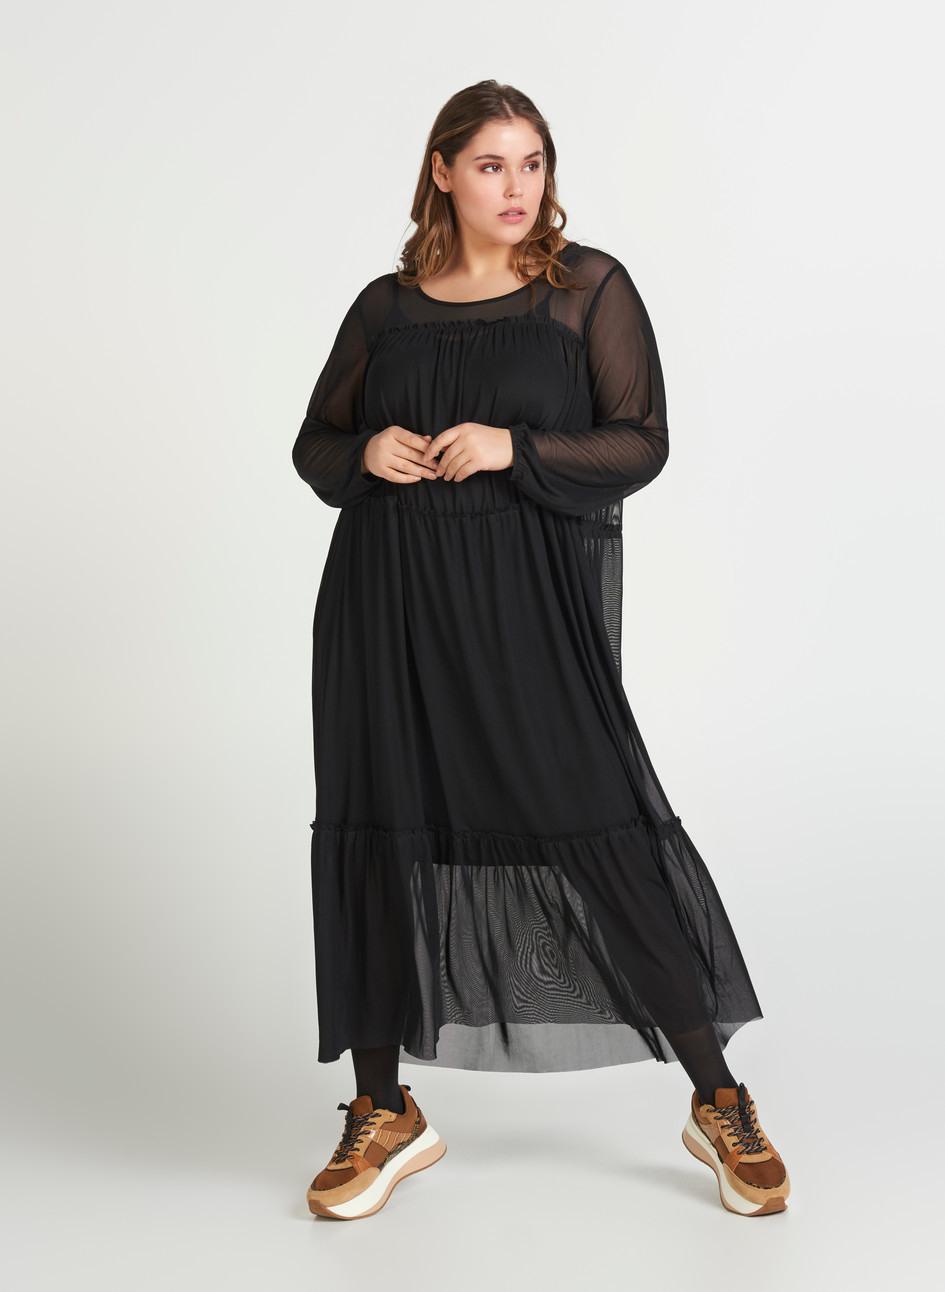 Kleid  Schwarz  Str 4256  Zizzide